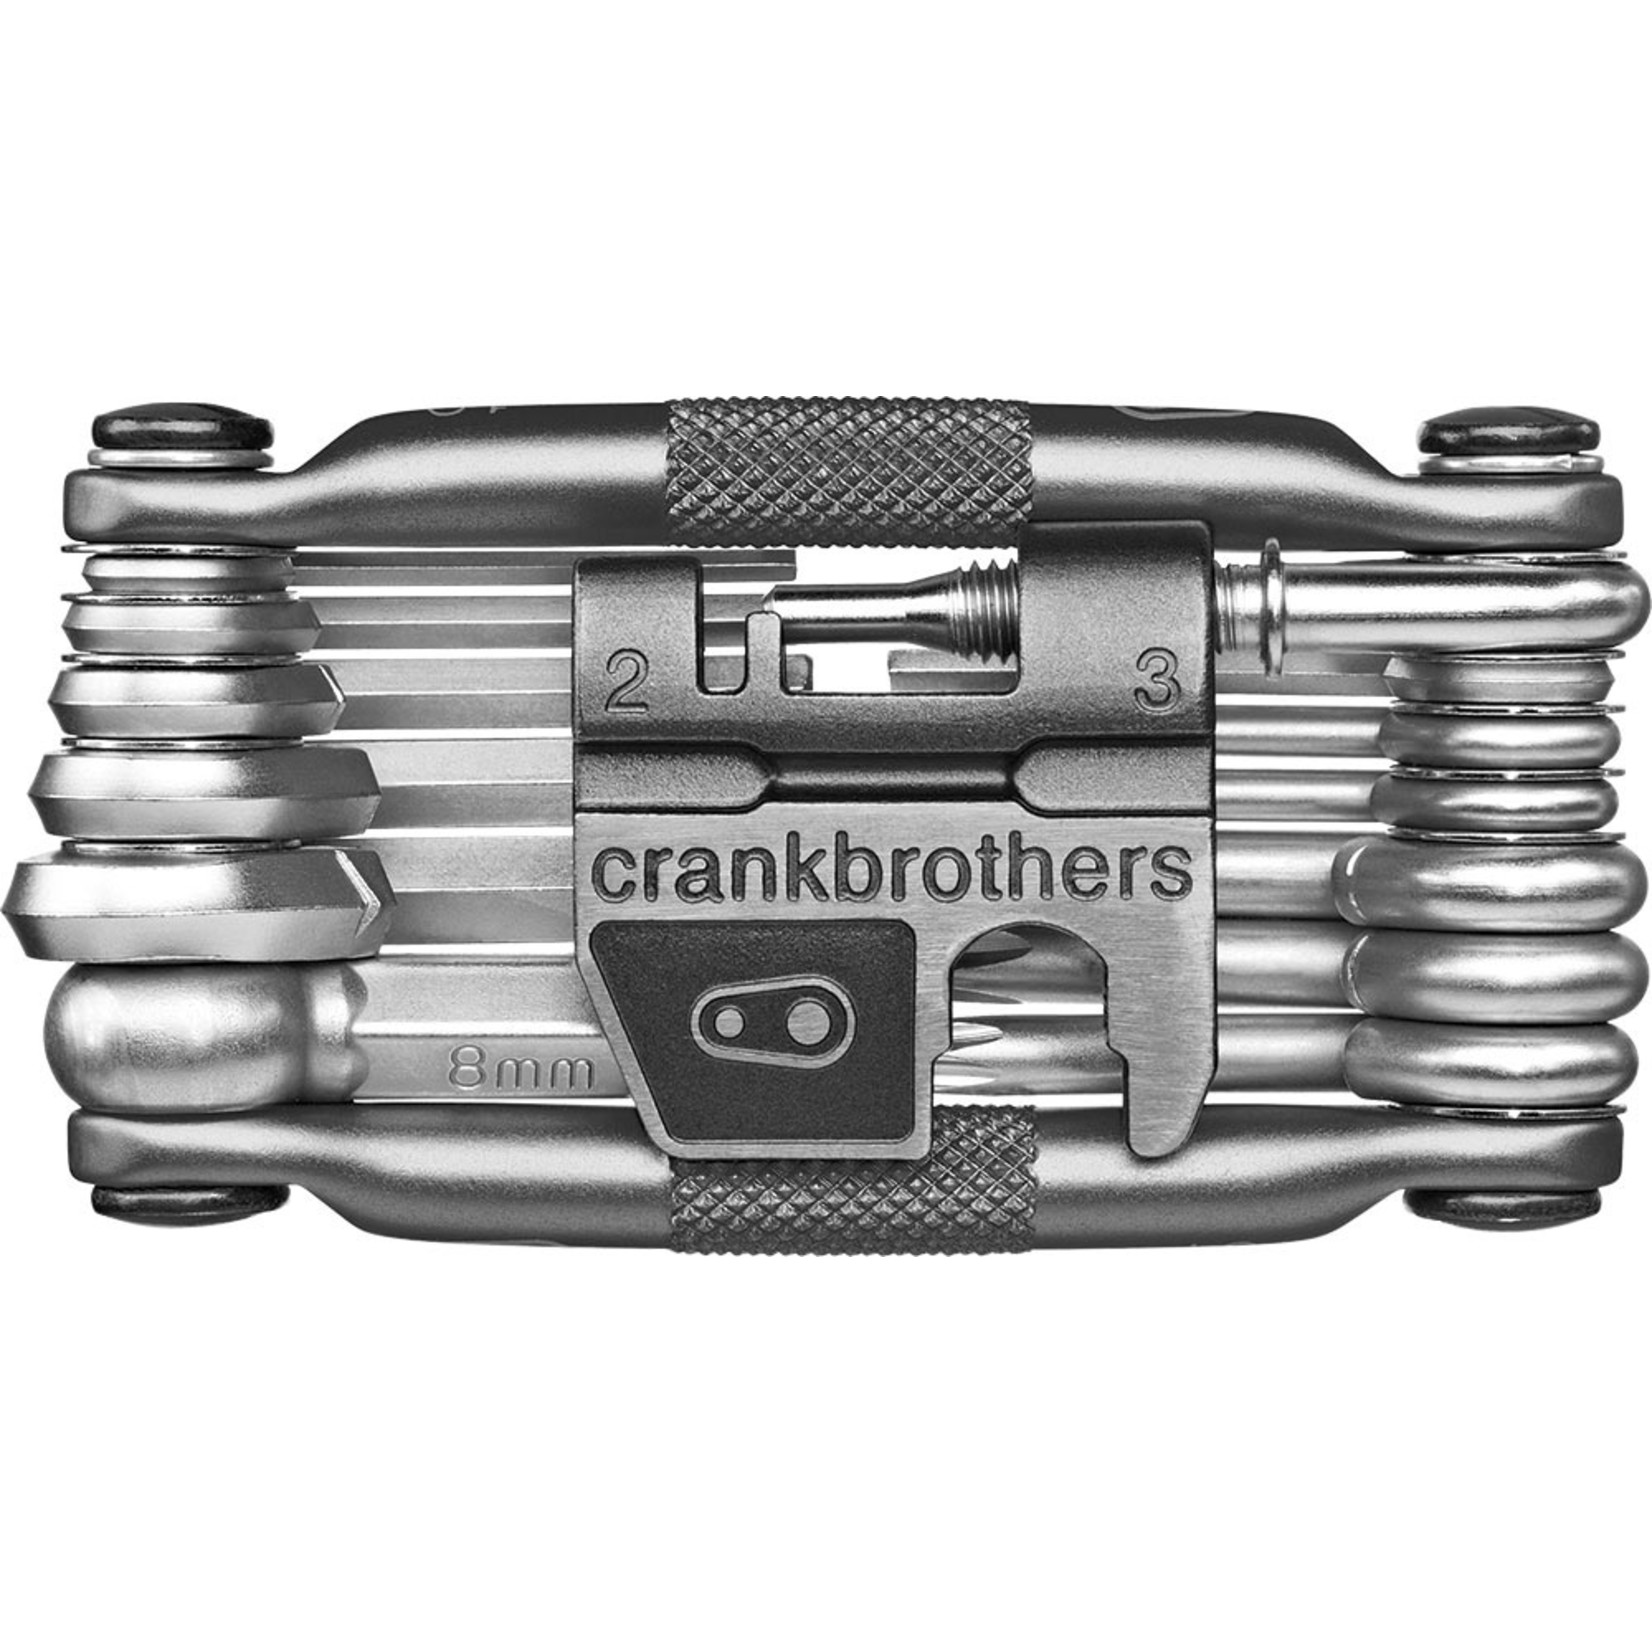 Crank Brothers Multitool Crankbrothers M19